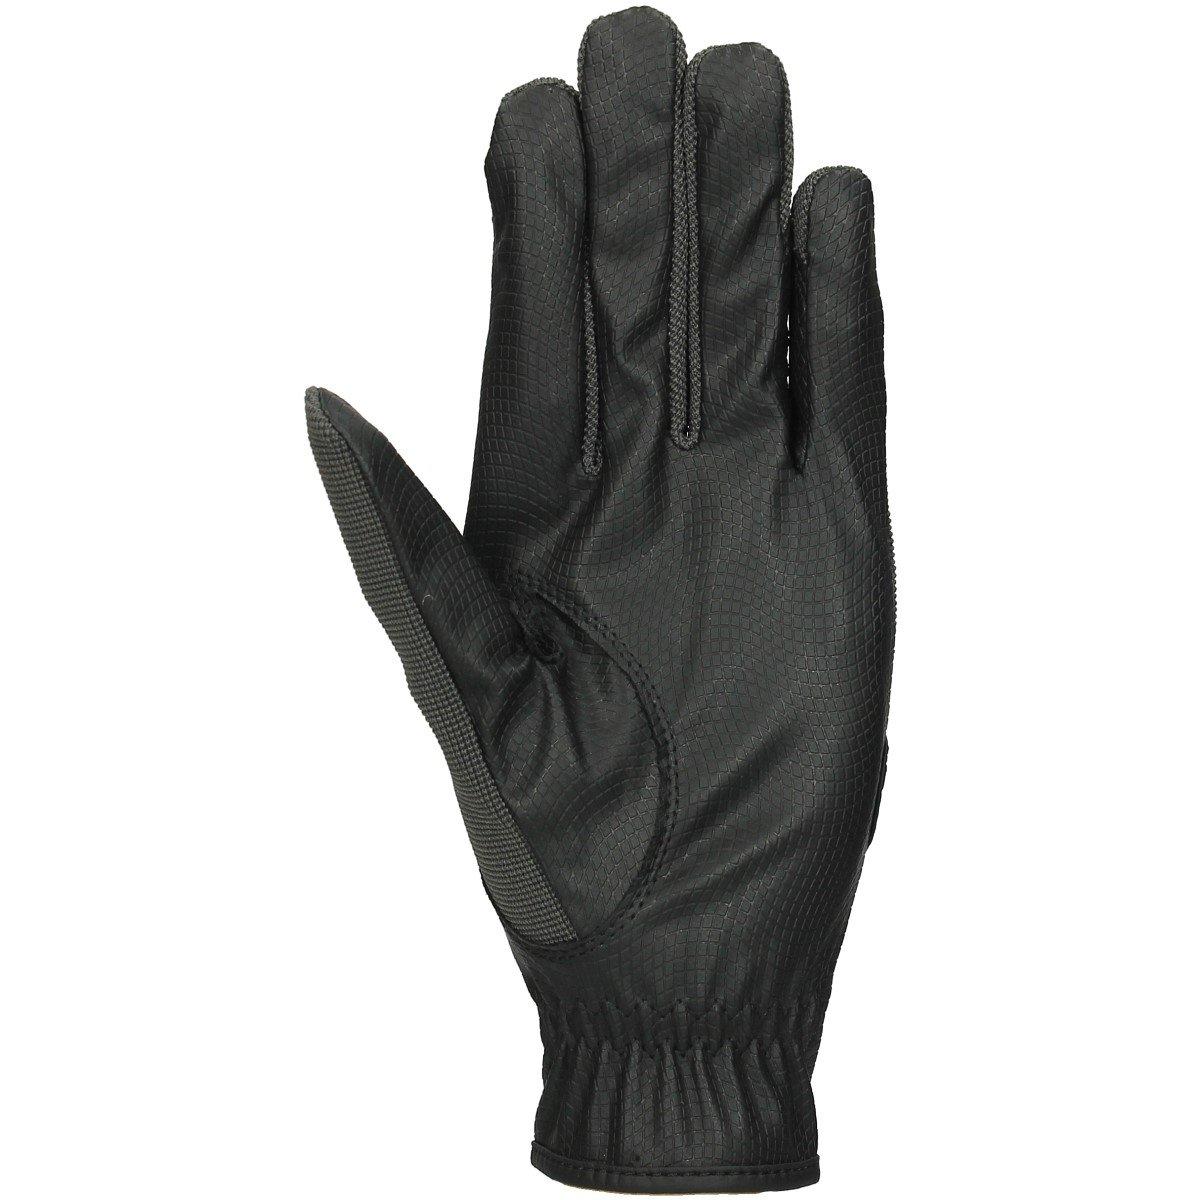 Roeckl sports ROECKL Reit Handschuhe 3301-268 walnuss 7